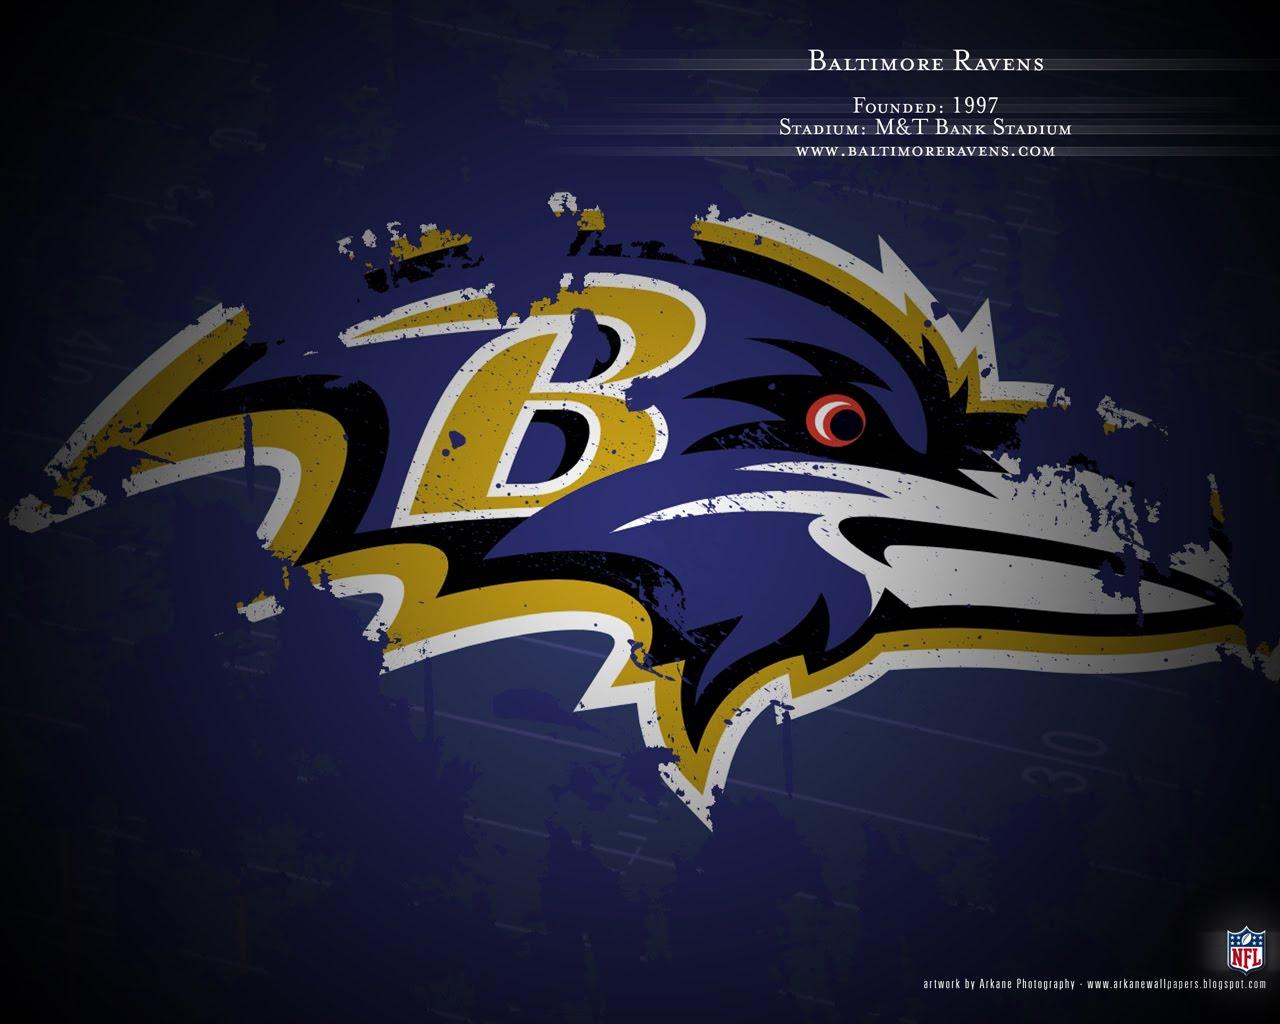 Baltimore Ravens Computer Wallpapers Desktop Backgrounds 1280x1024 1280x1024